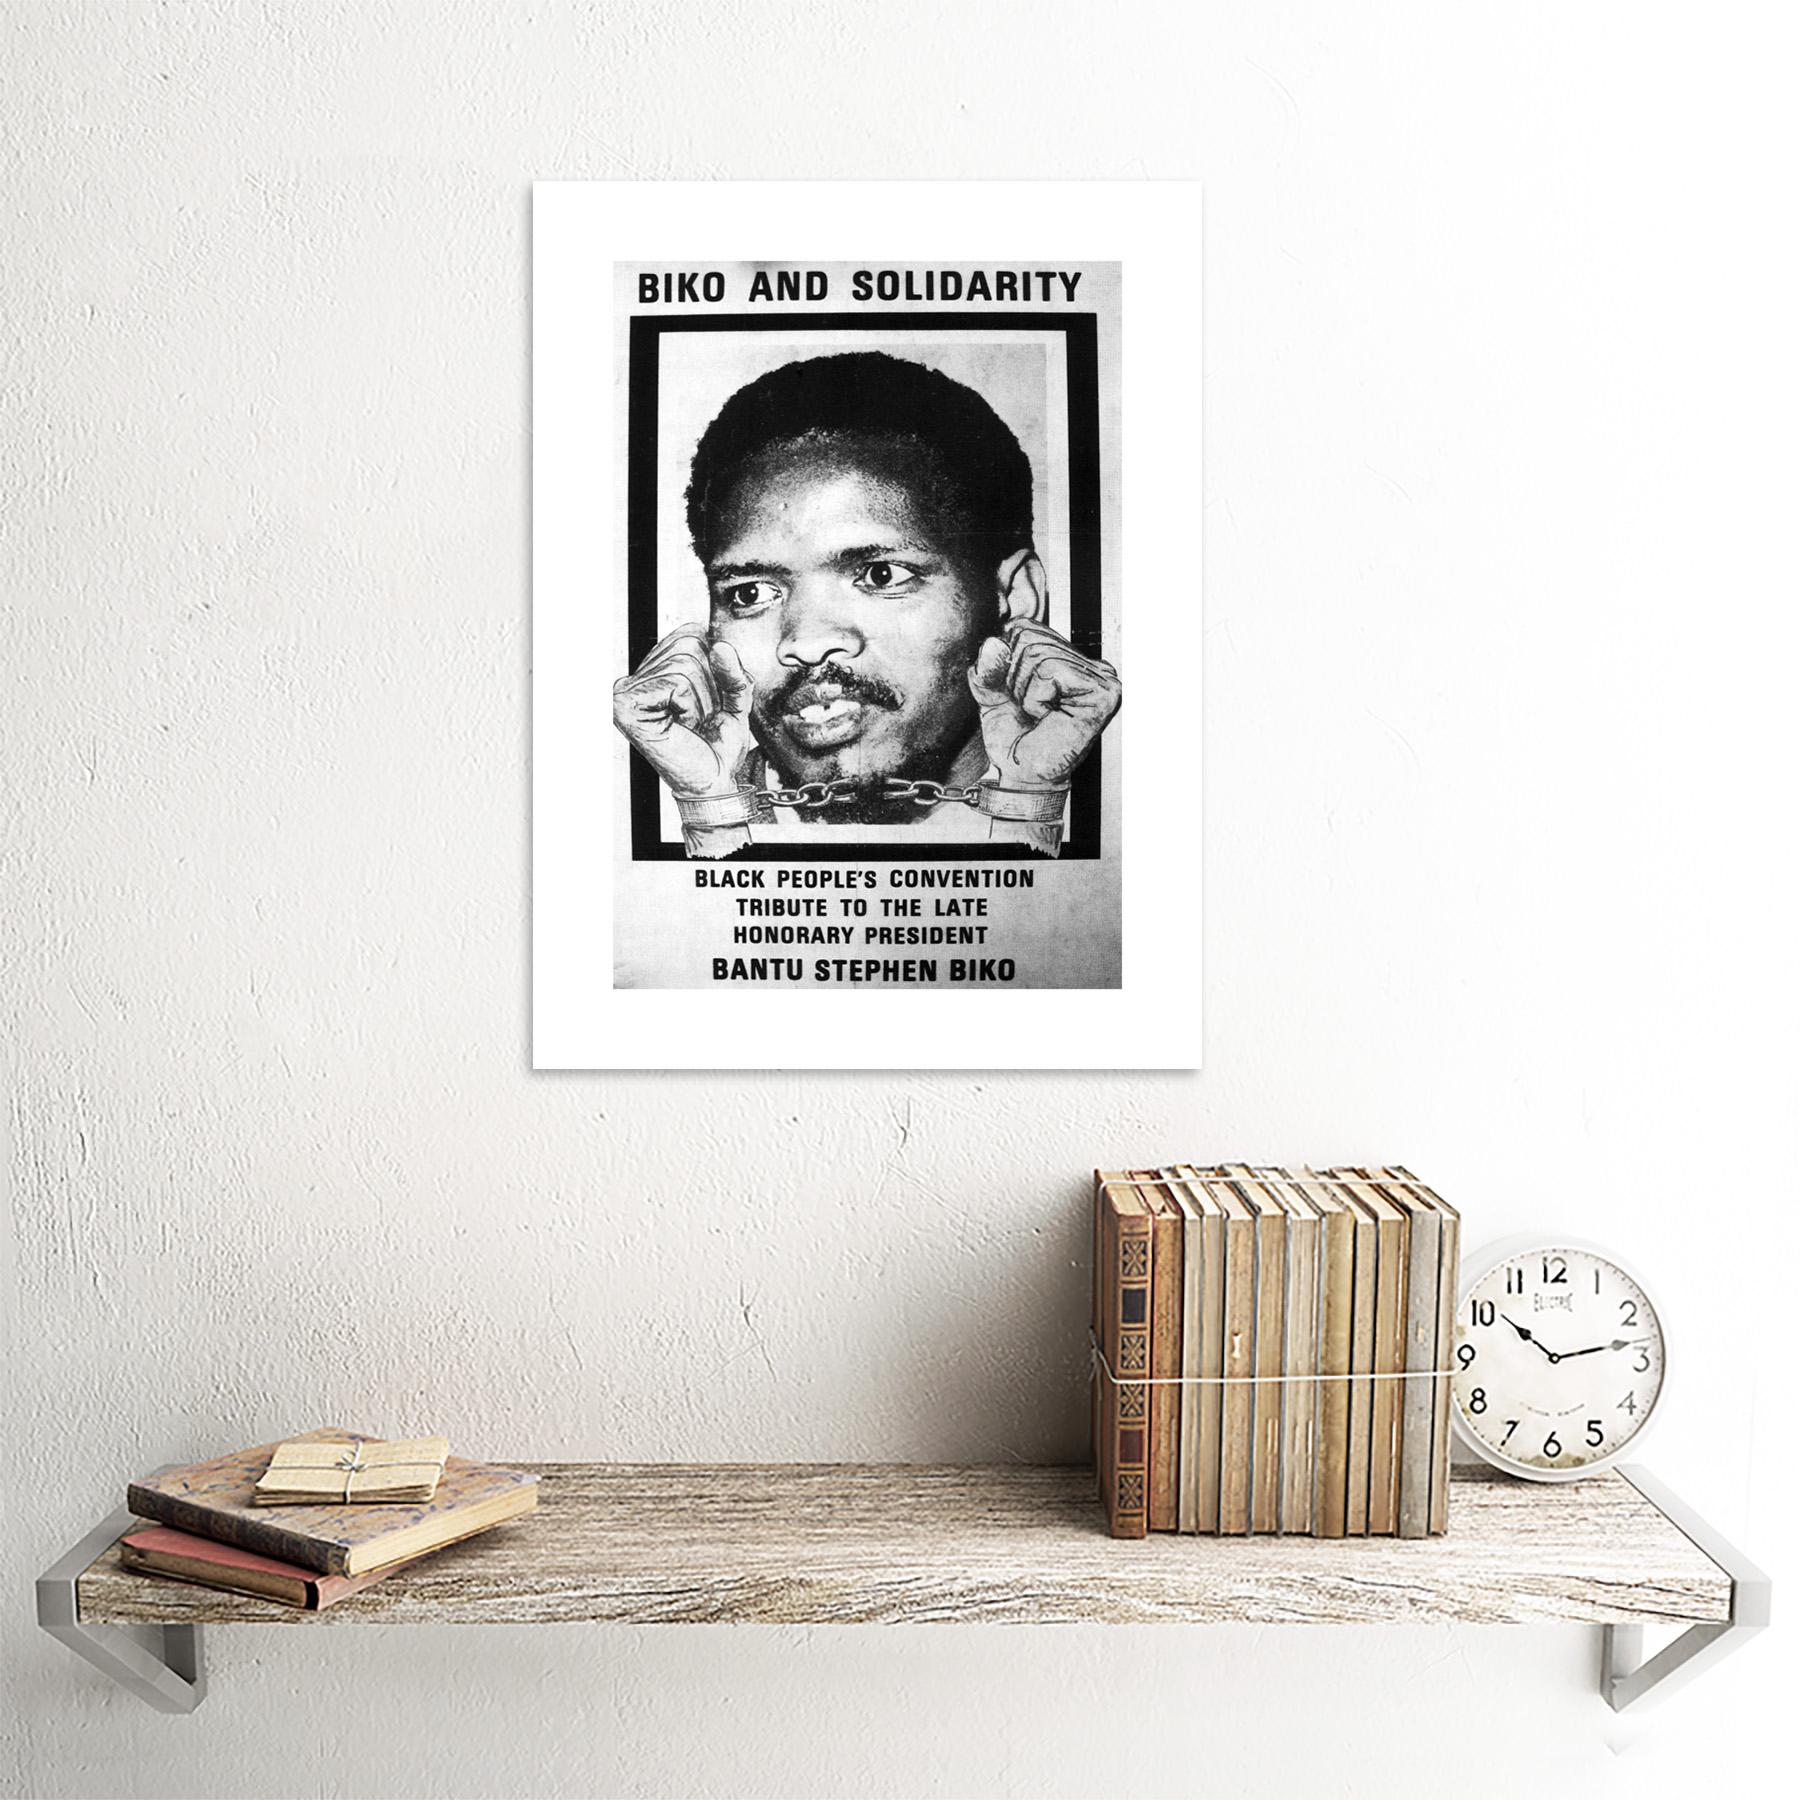 thumbnail 15 - Political Steve Biko Anc Apartheid South Africa Framed Wall Art Print